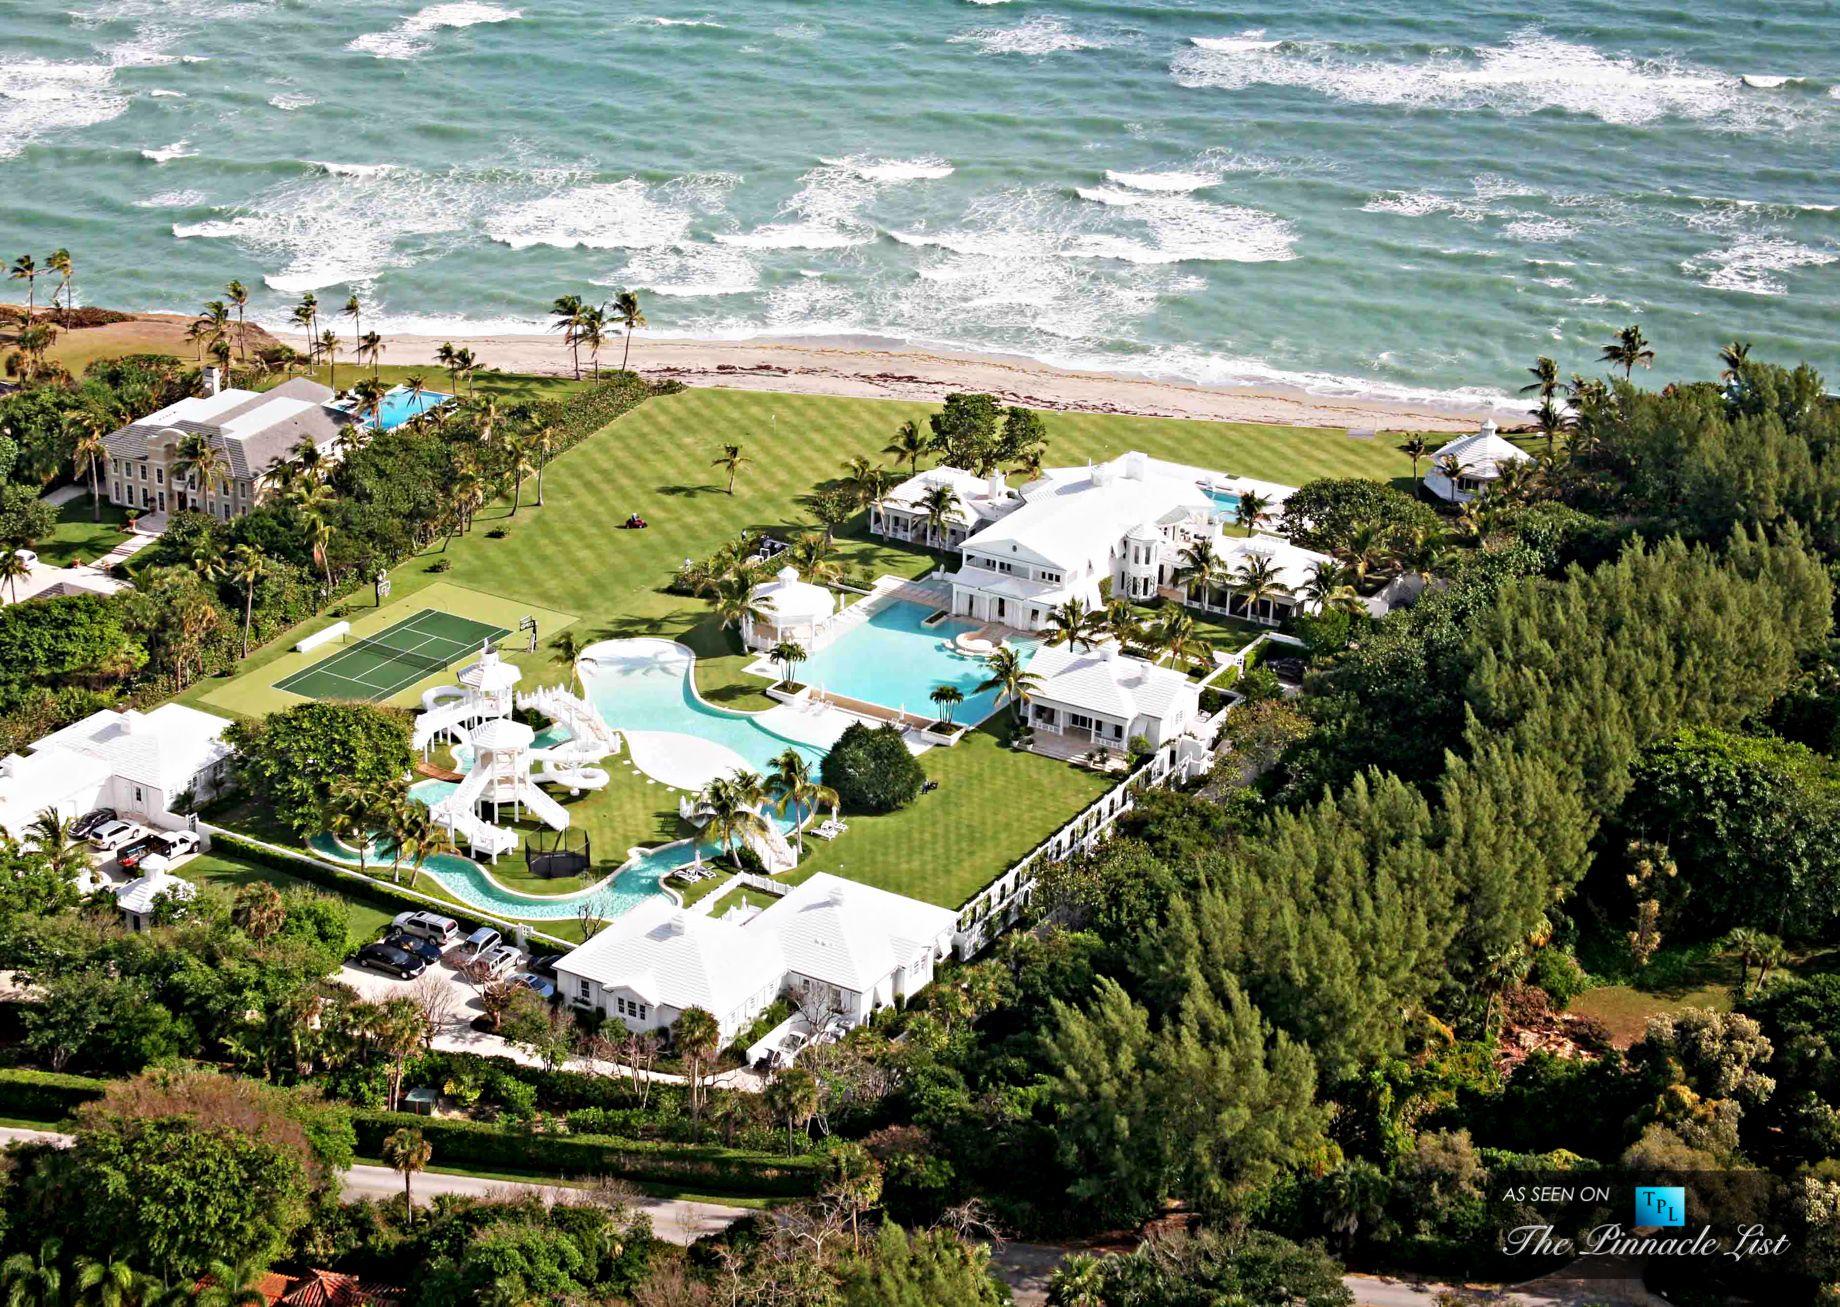 Celine dion residence 215 s beach rd jupiter island for Celine dion jupiter island home for sale